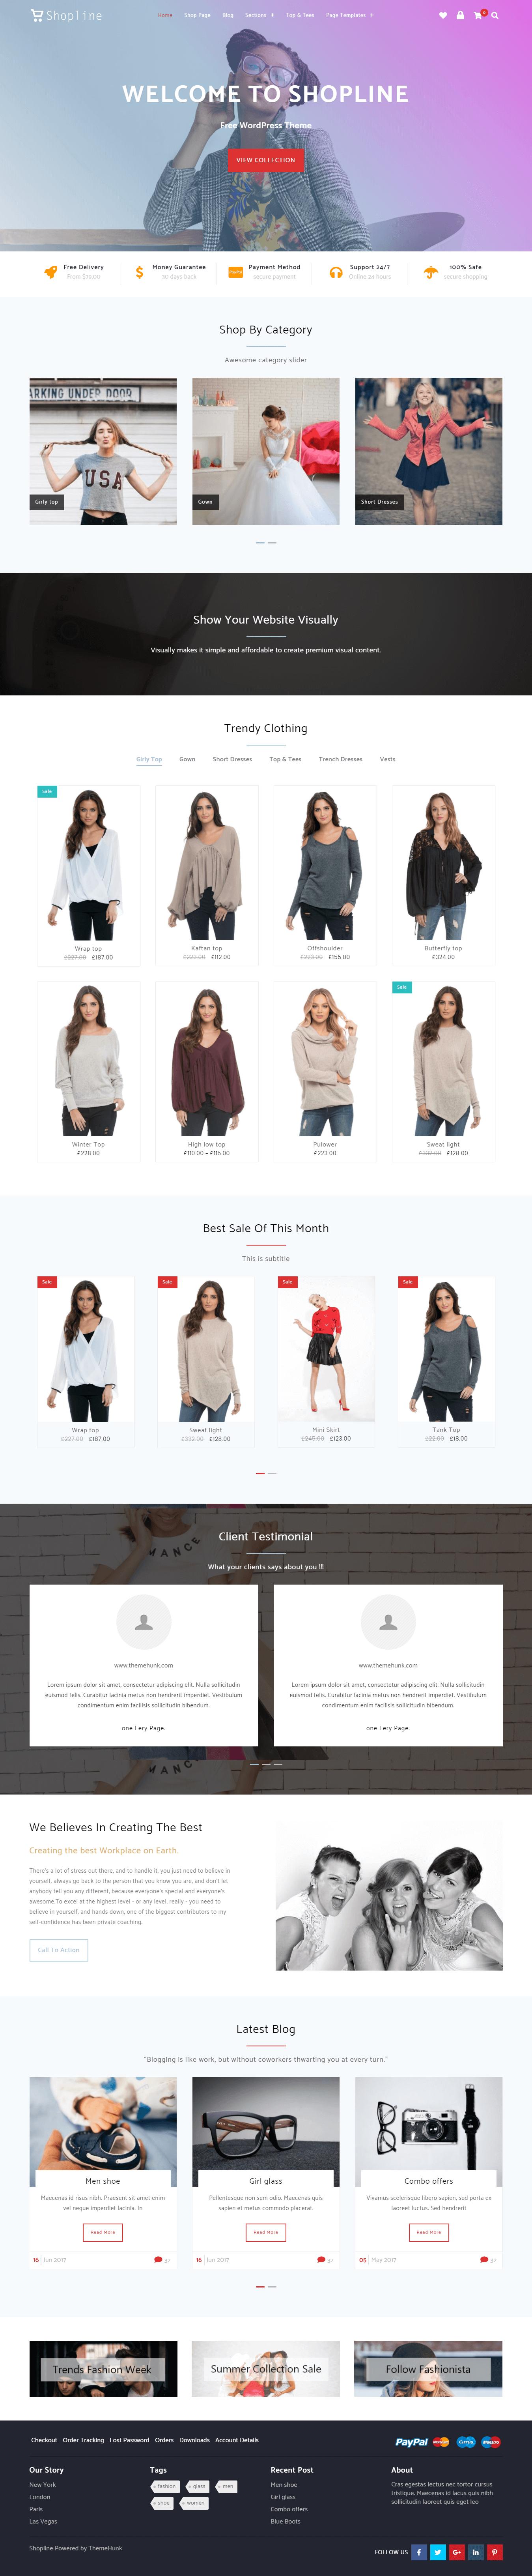 Shopline Demo 1